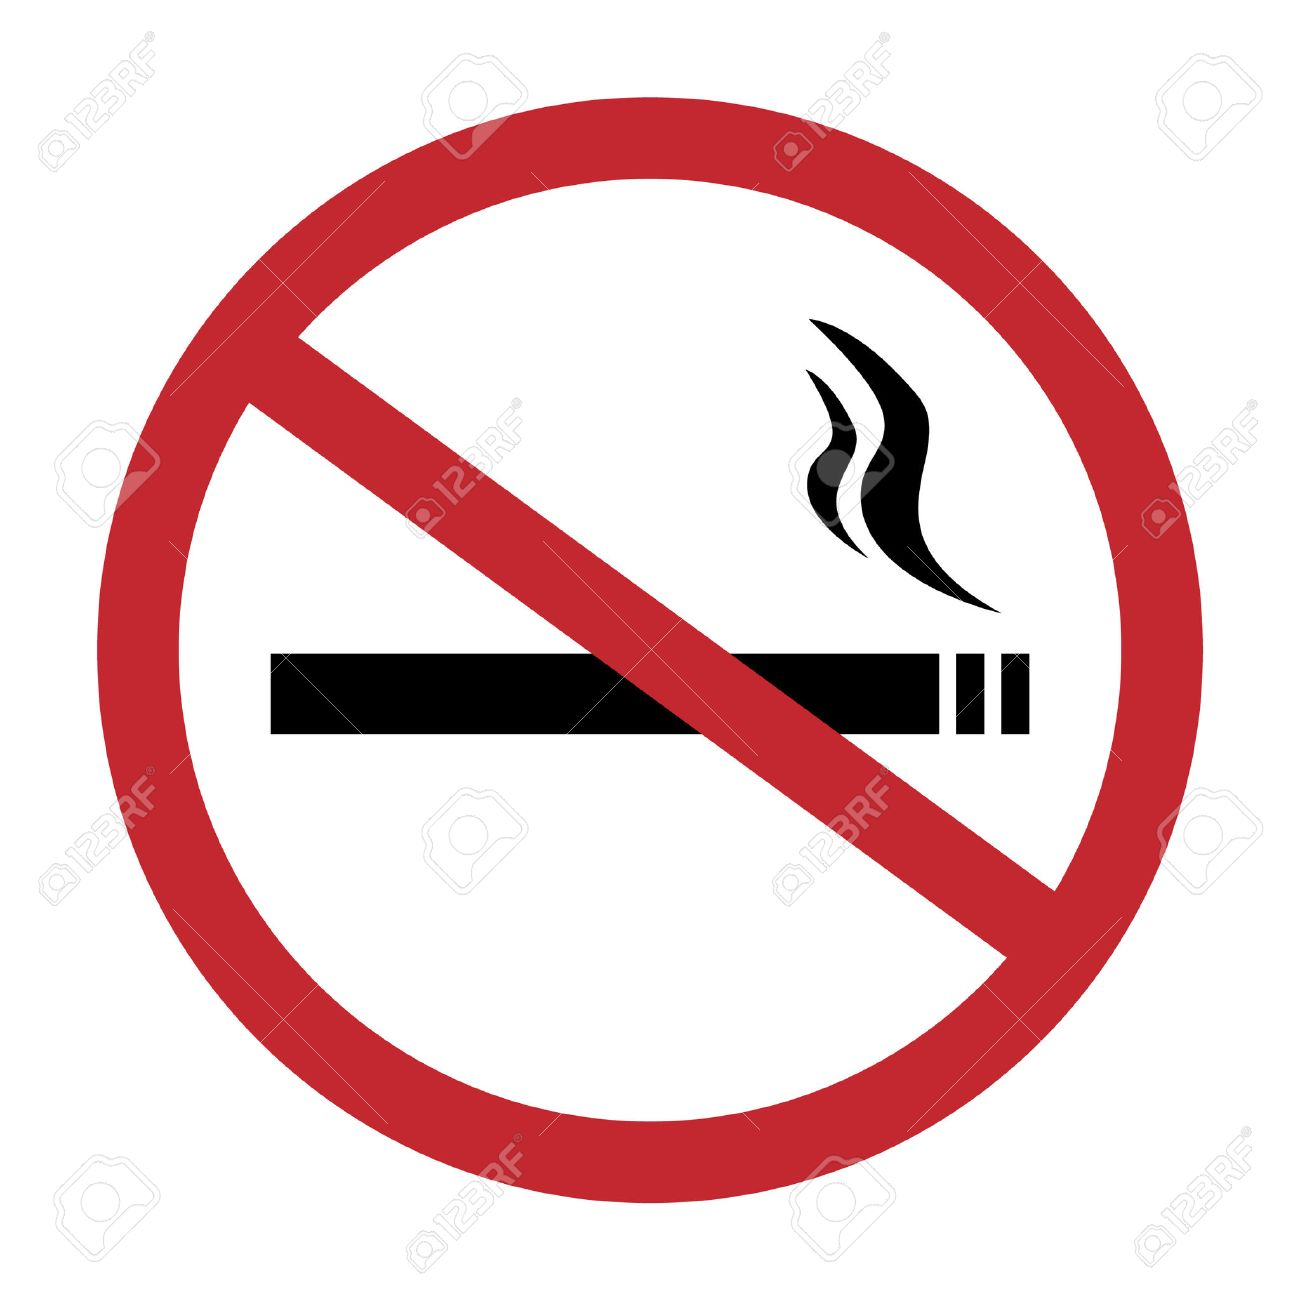 round no smoking sign quit smoking smoke free no smoking icon